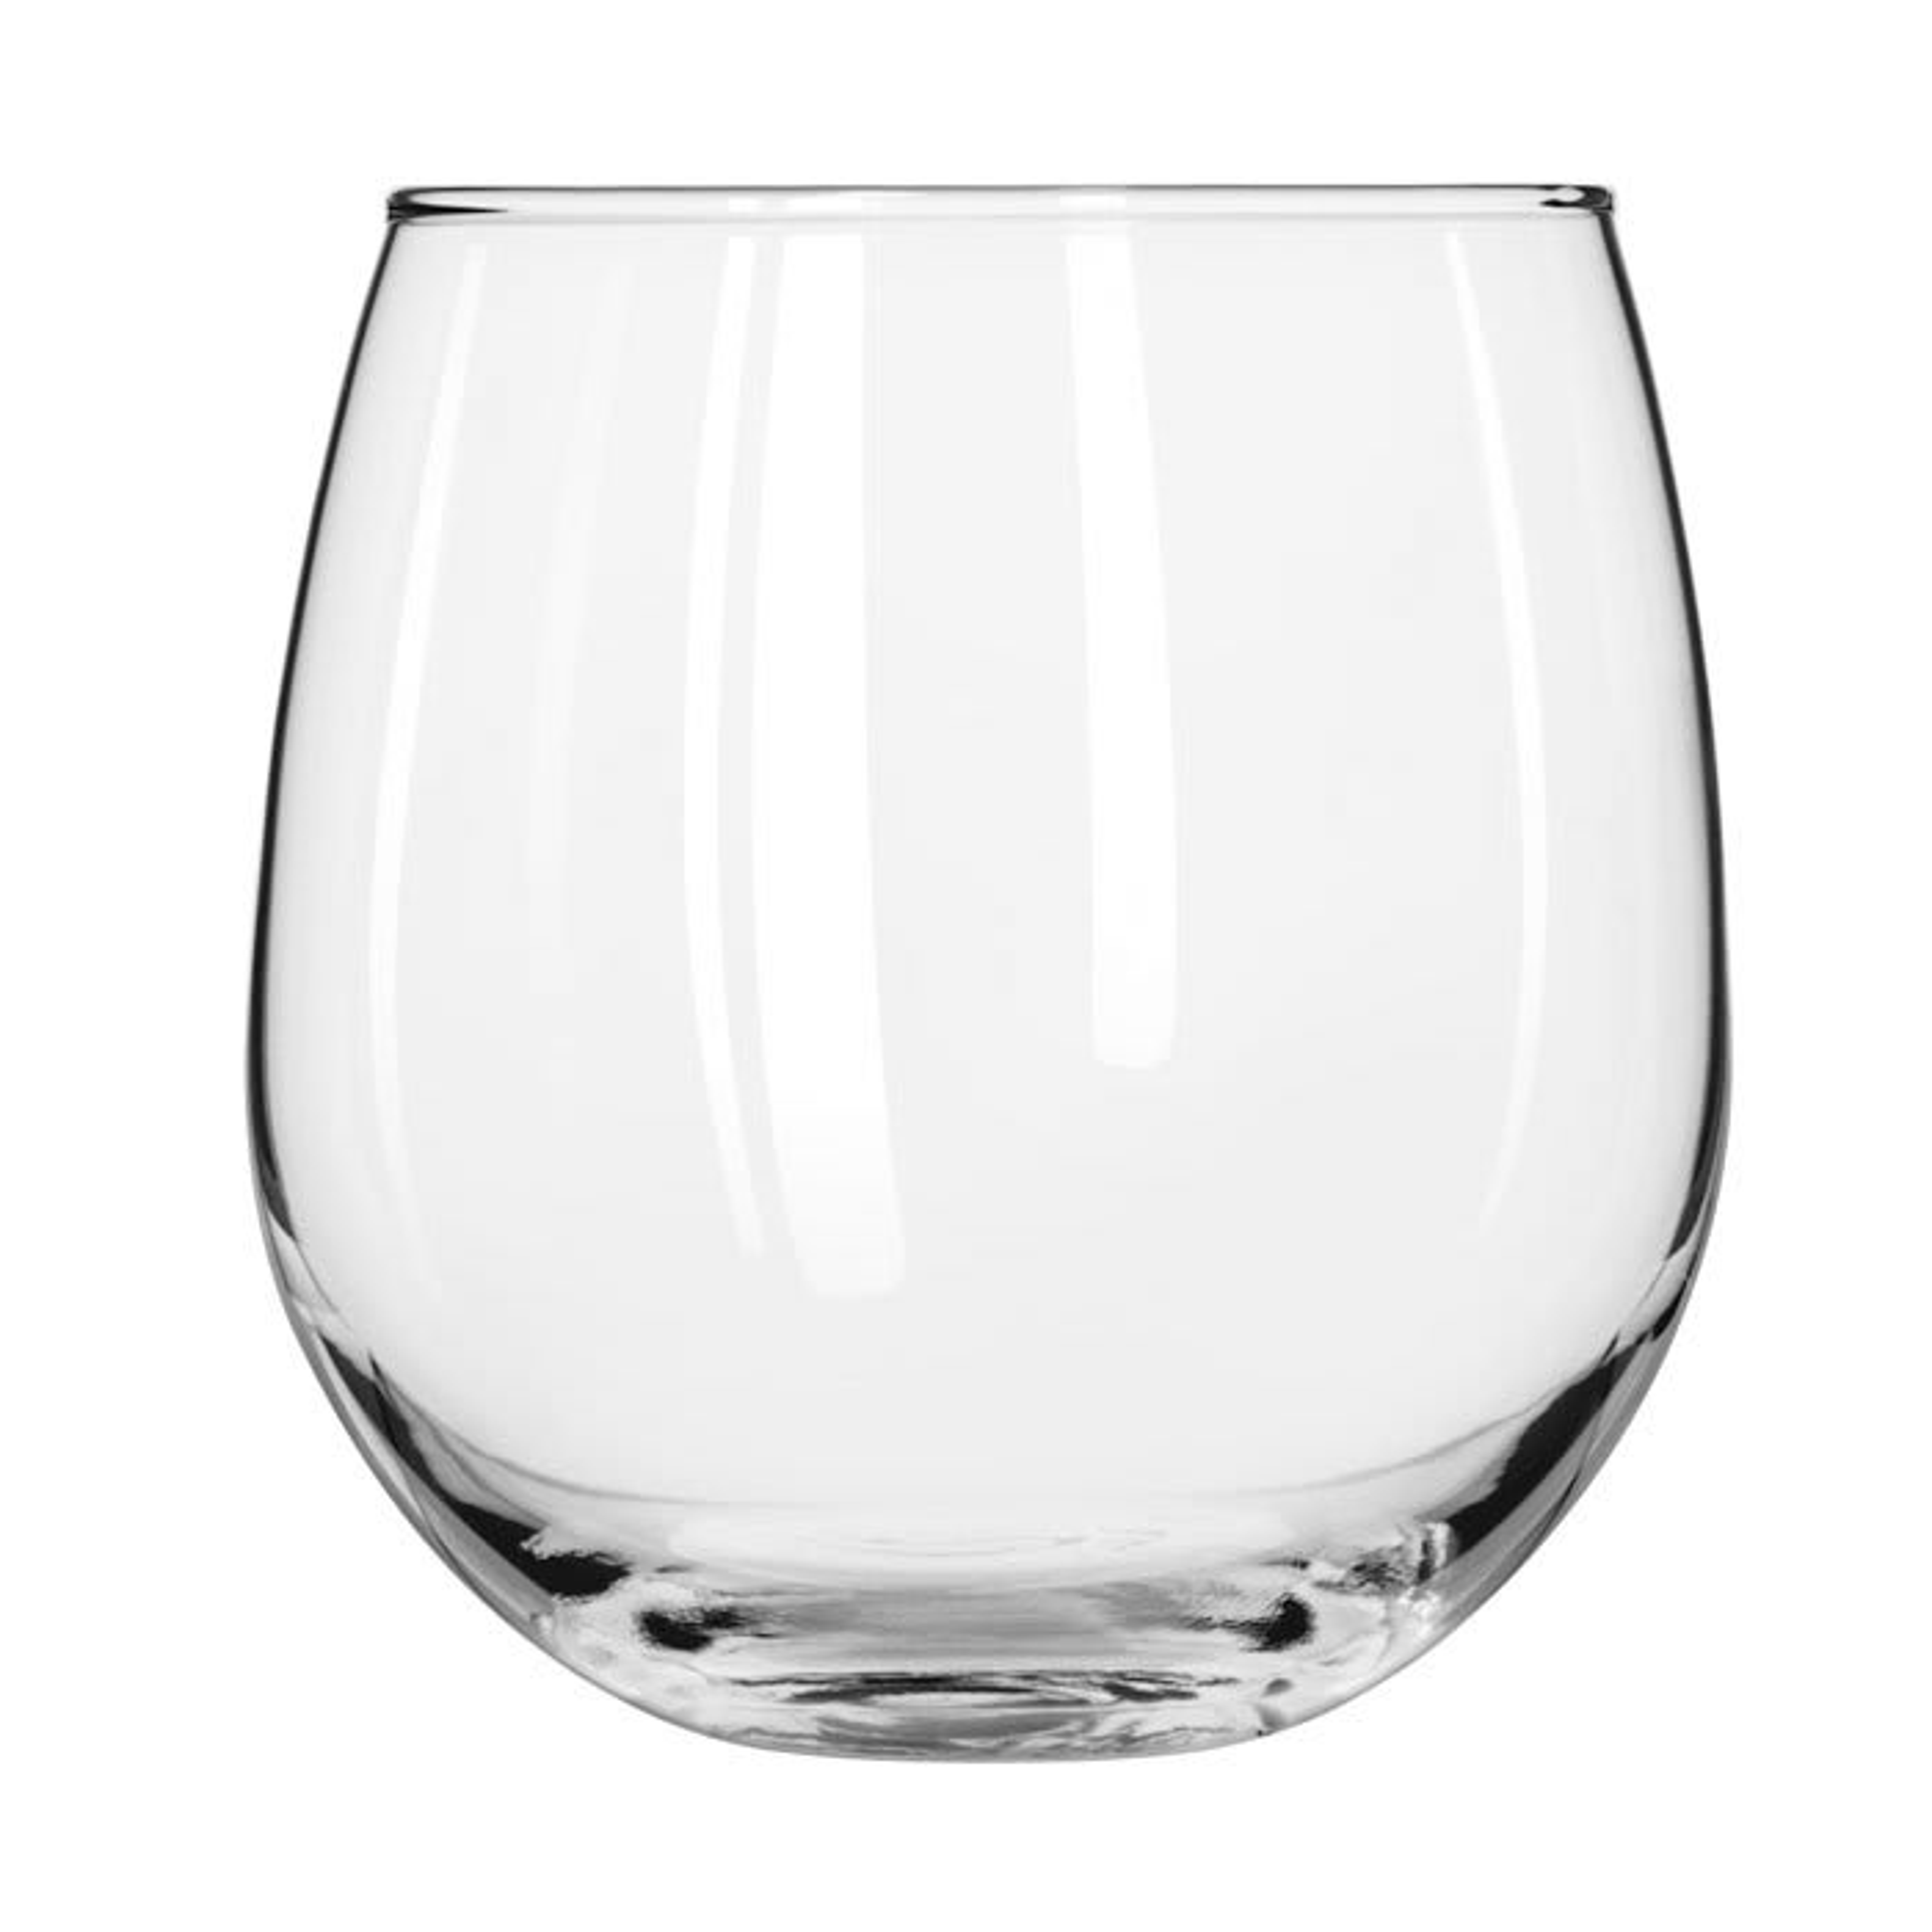 Libbey 222 16.75-oz Stemless Red Wine Glass